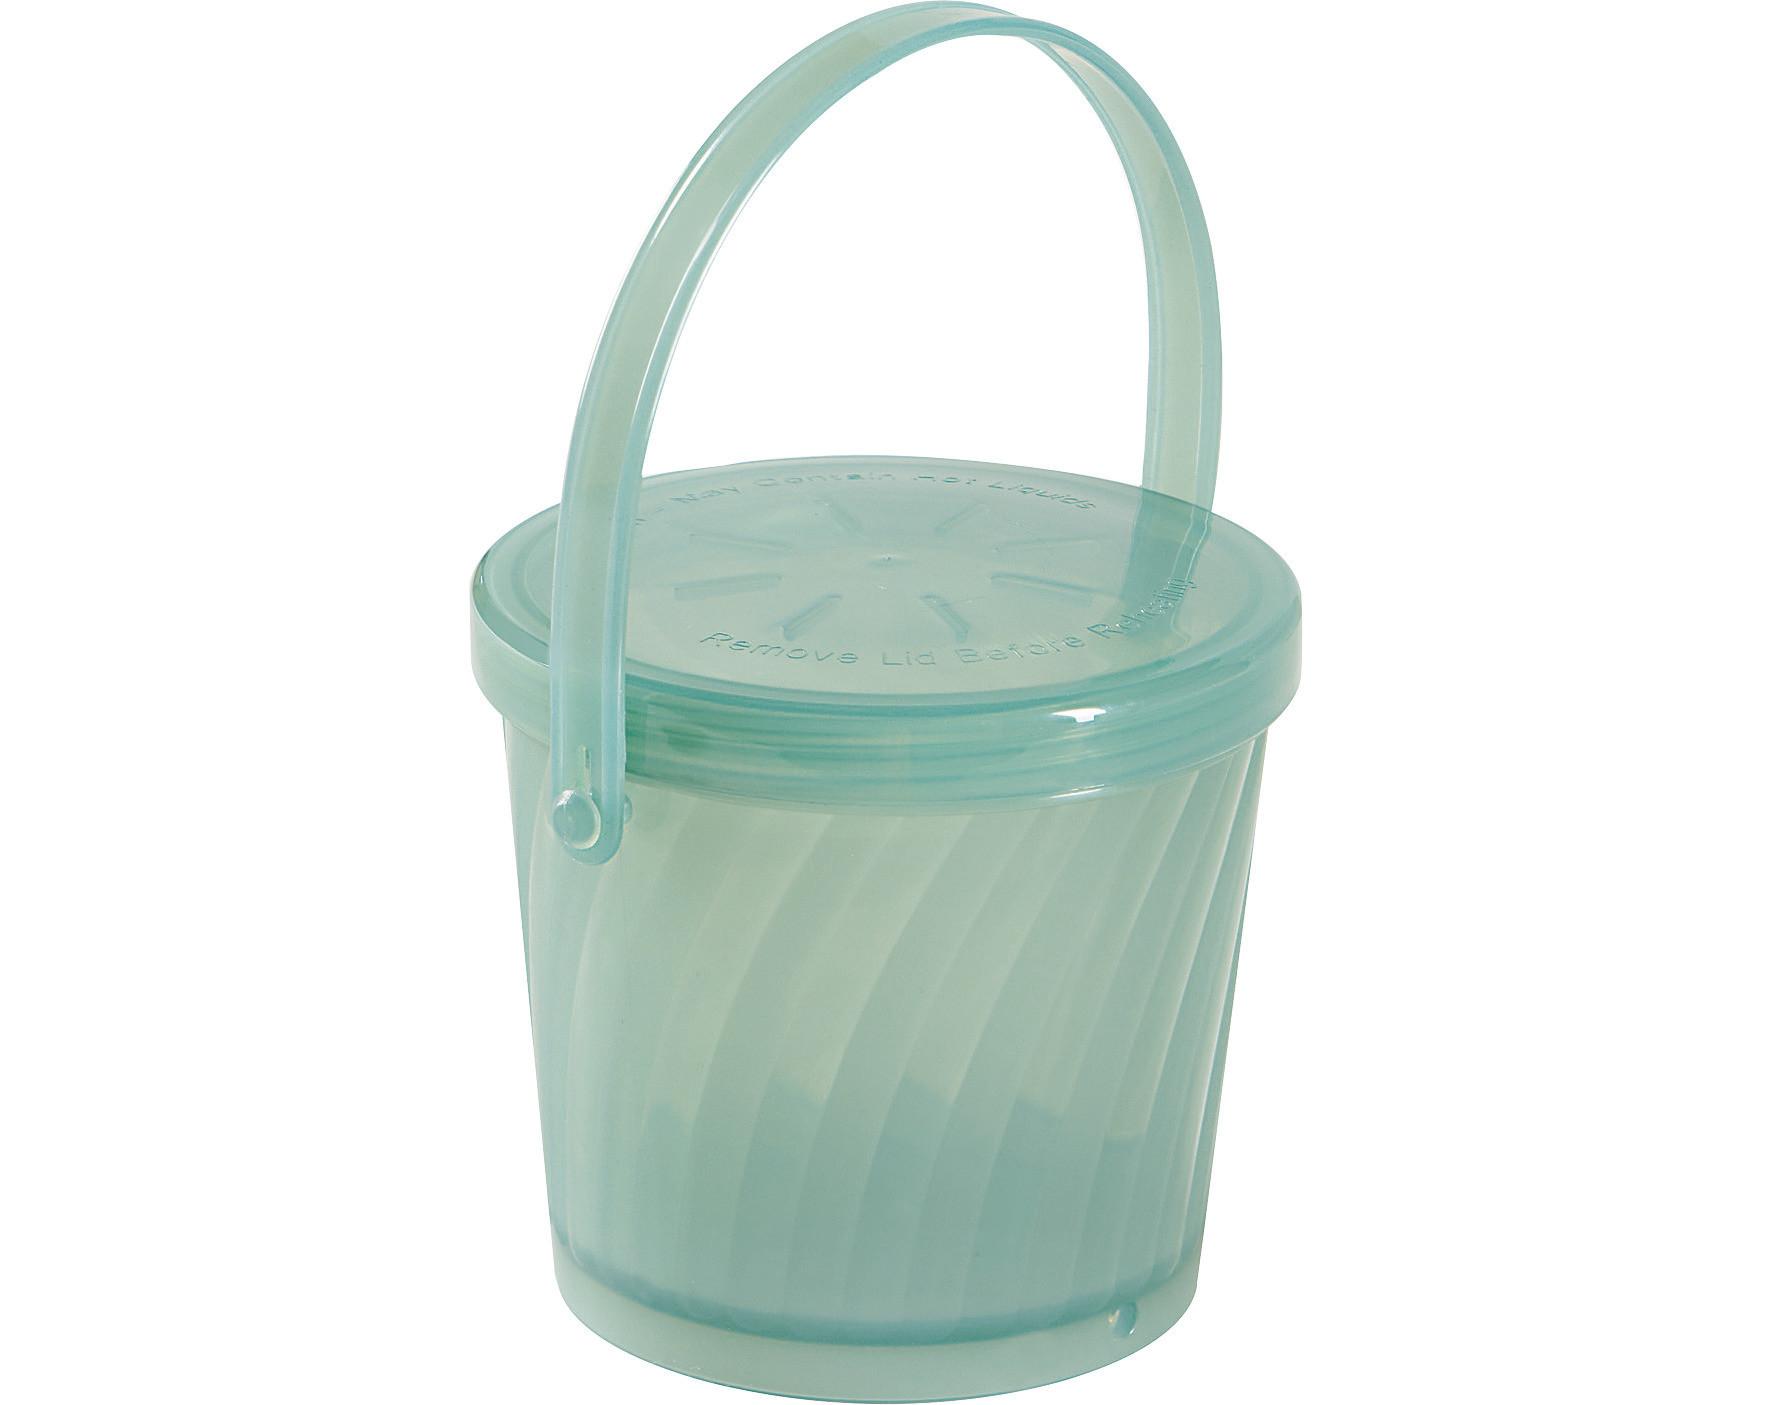 Suppenbehälter (groß) 0,47 l / 108 x 108 x 95 mm jadegrün